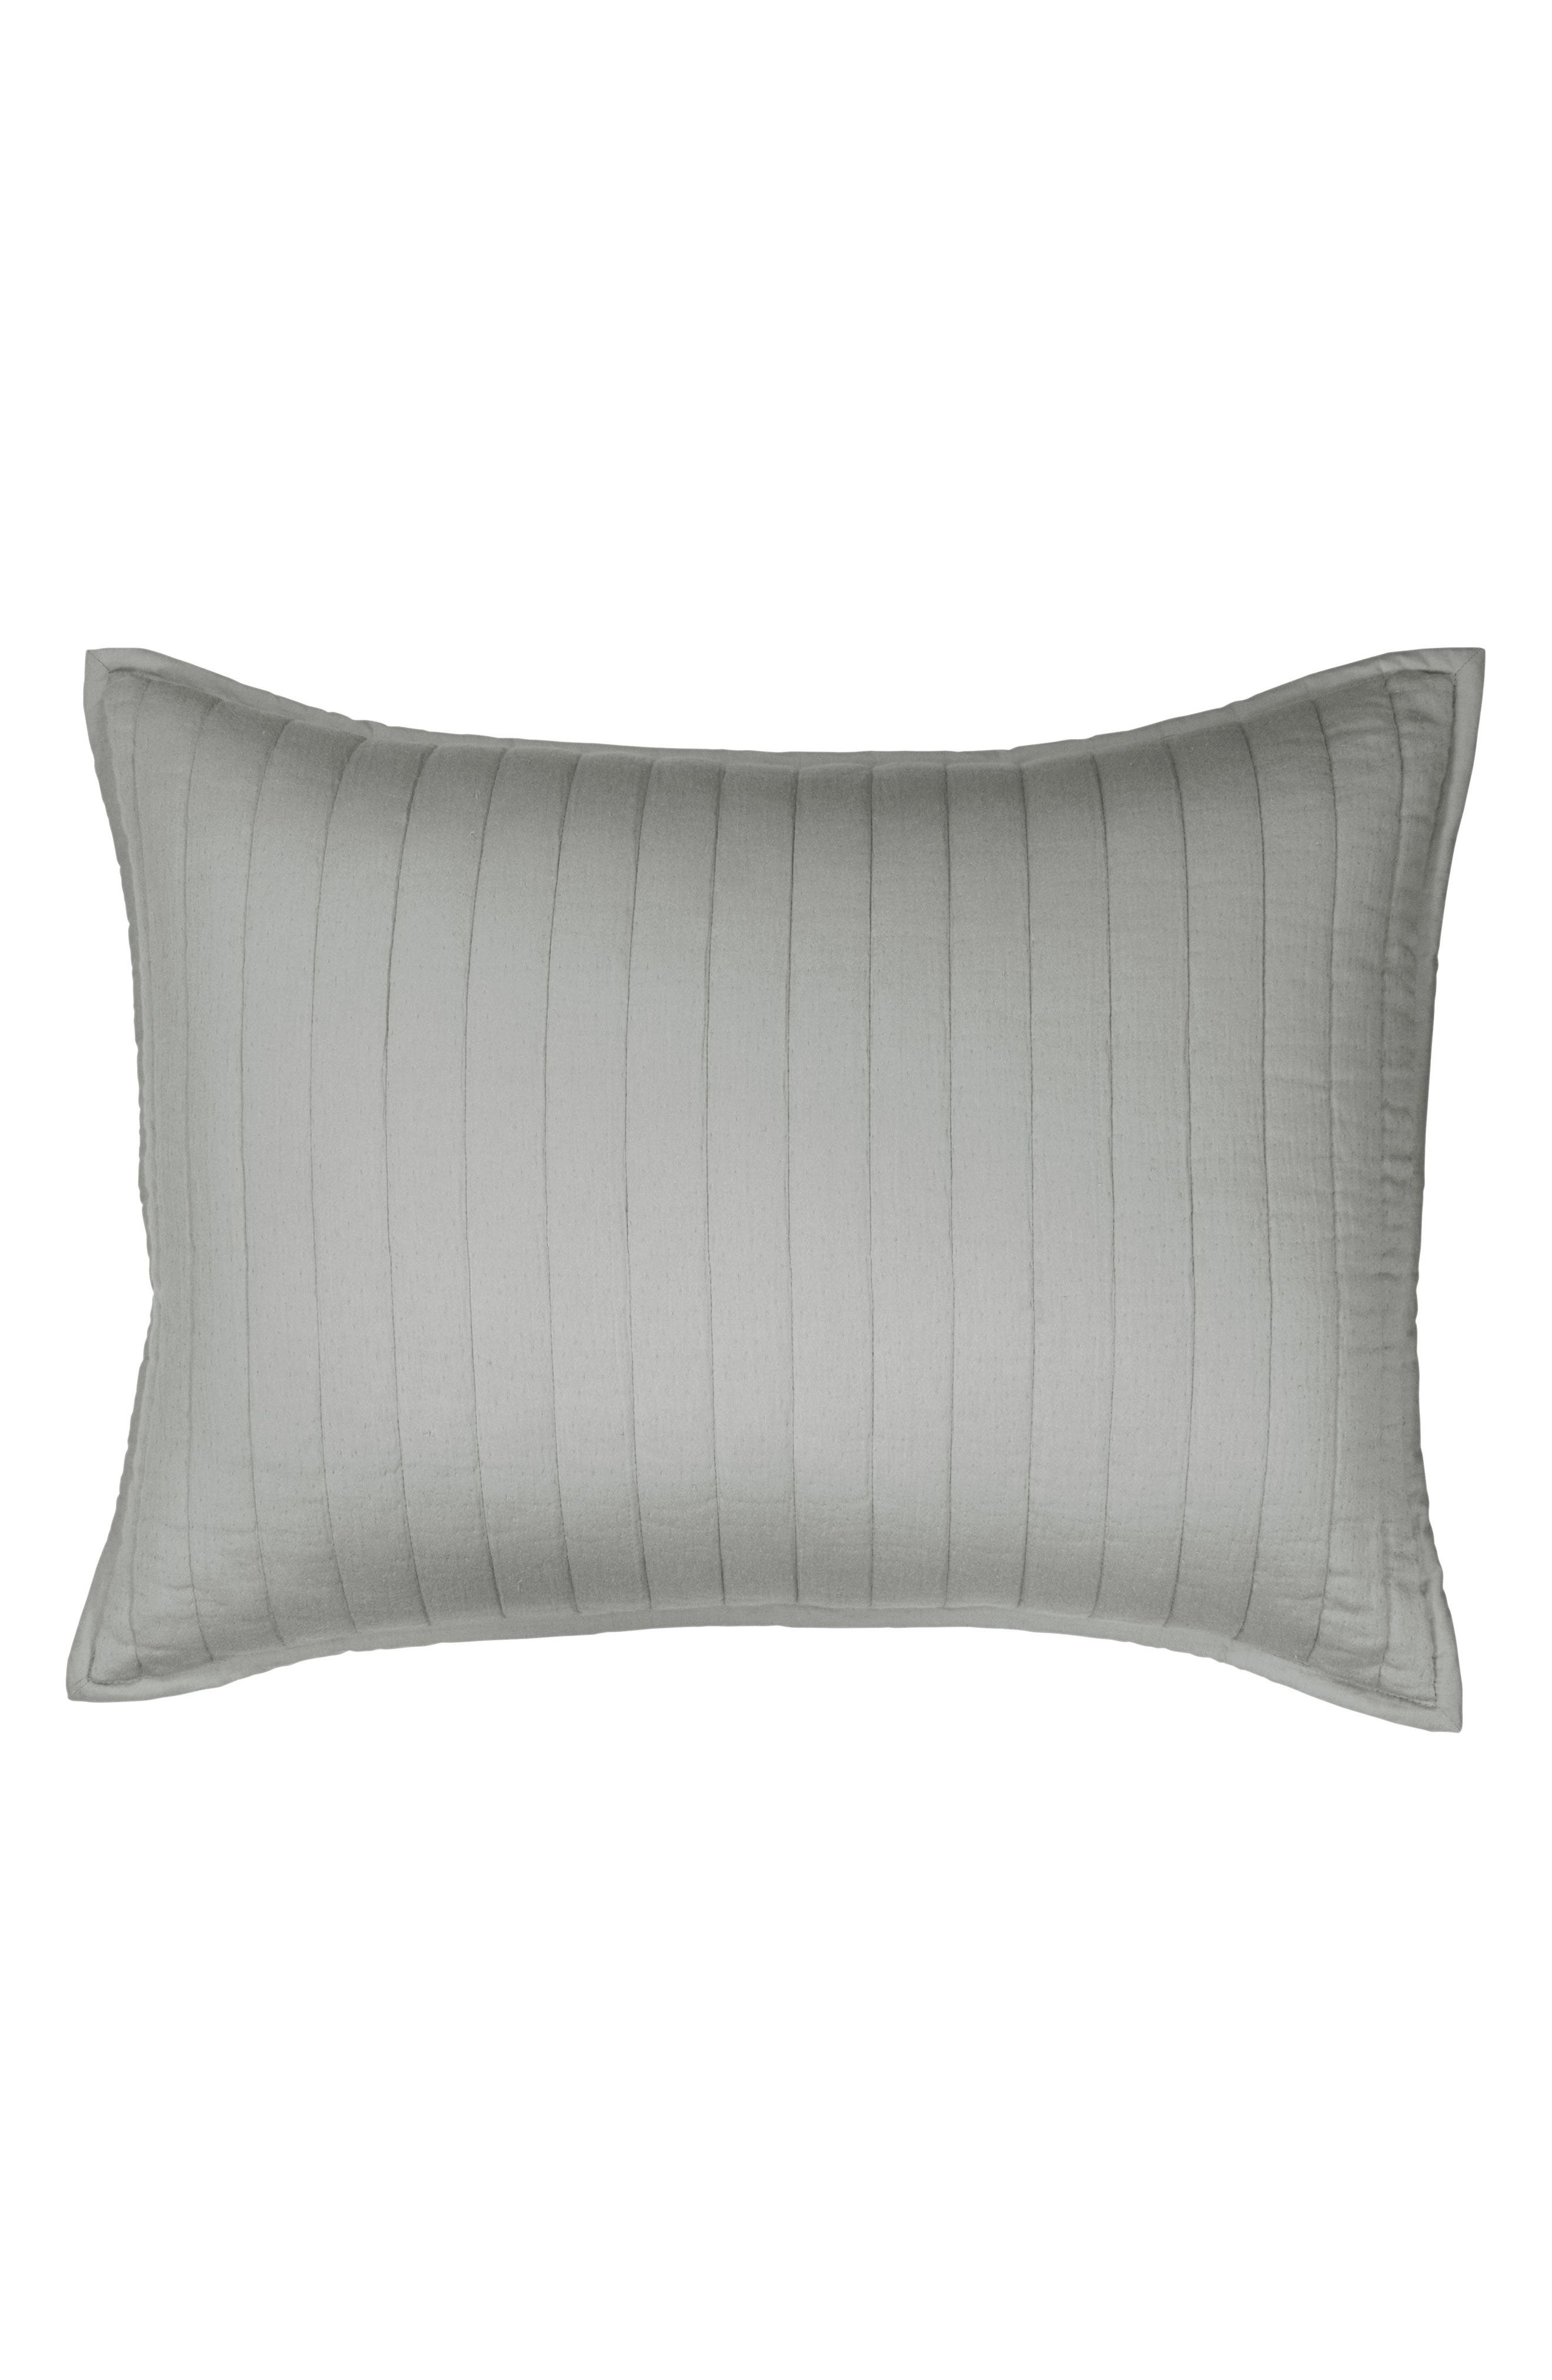 Donna Karan Casual Luxe Pillow Sham,                             Main thumbnail 1, color,                             GREY